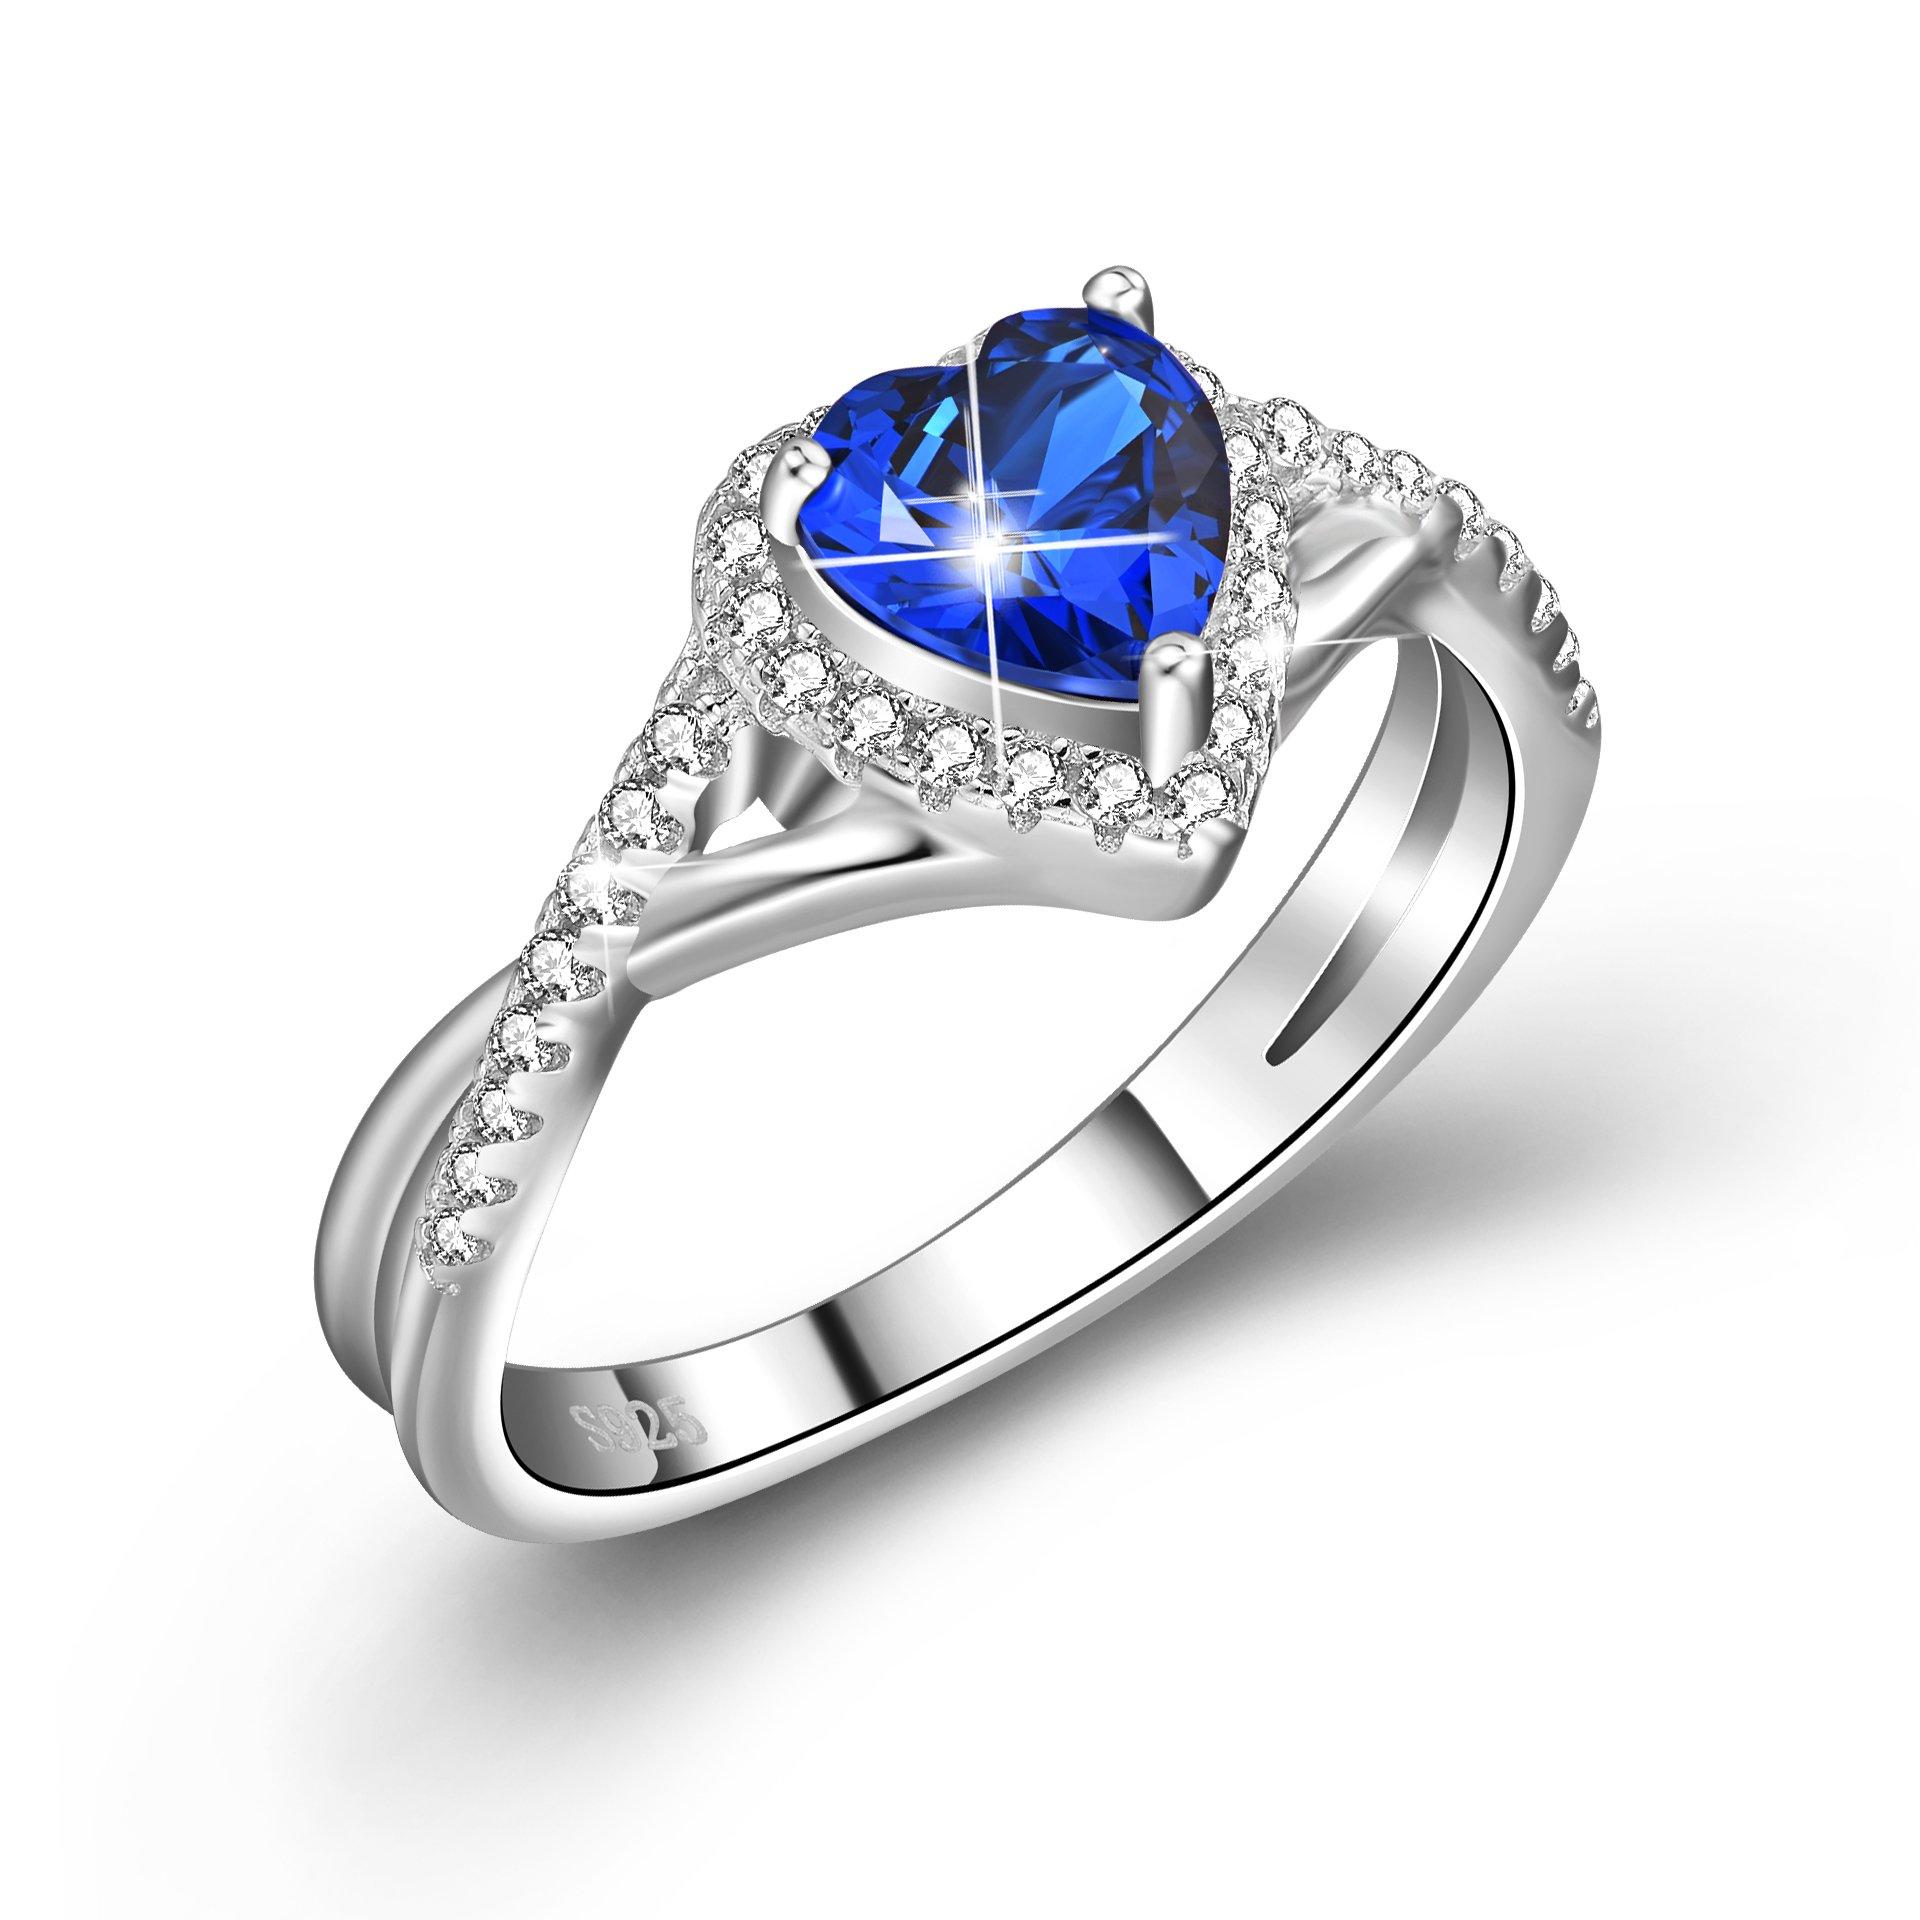 YFN Love Heart Ring Blue Cubic Zirconia Rings Sterling Silver Women Girls Jewelry Sizes 6.5 (6.5)